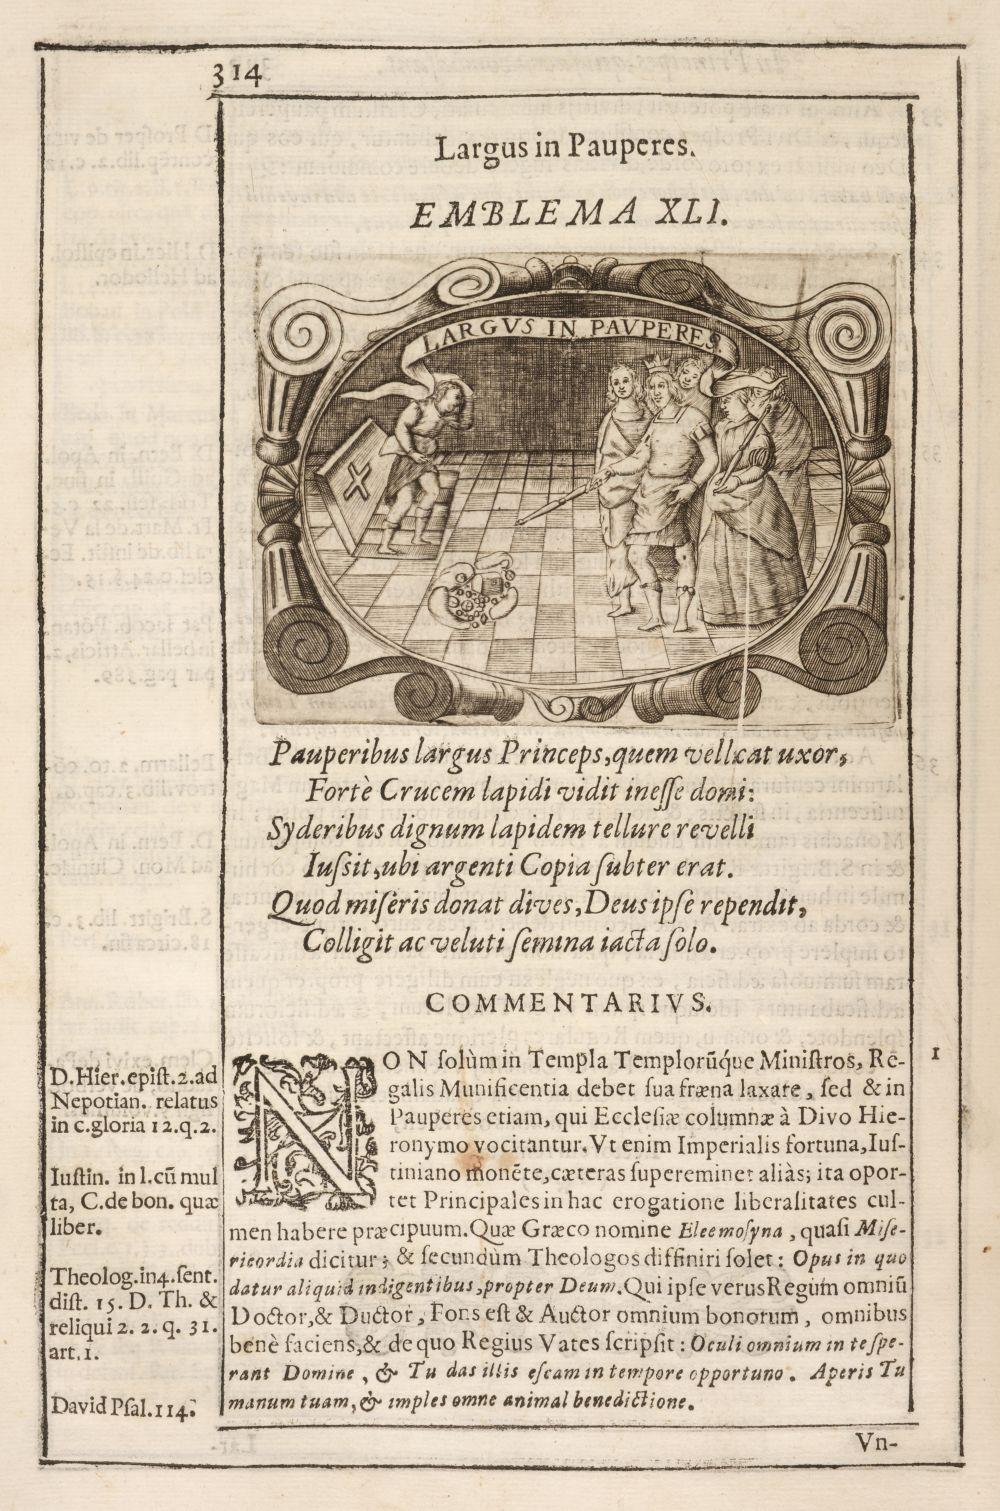 Solorzano Pereira (Juan de). Emblemata centum, regio politica, Madrid, 1653